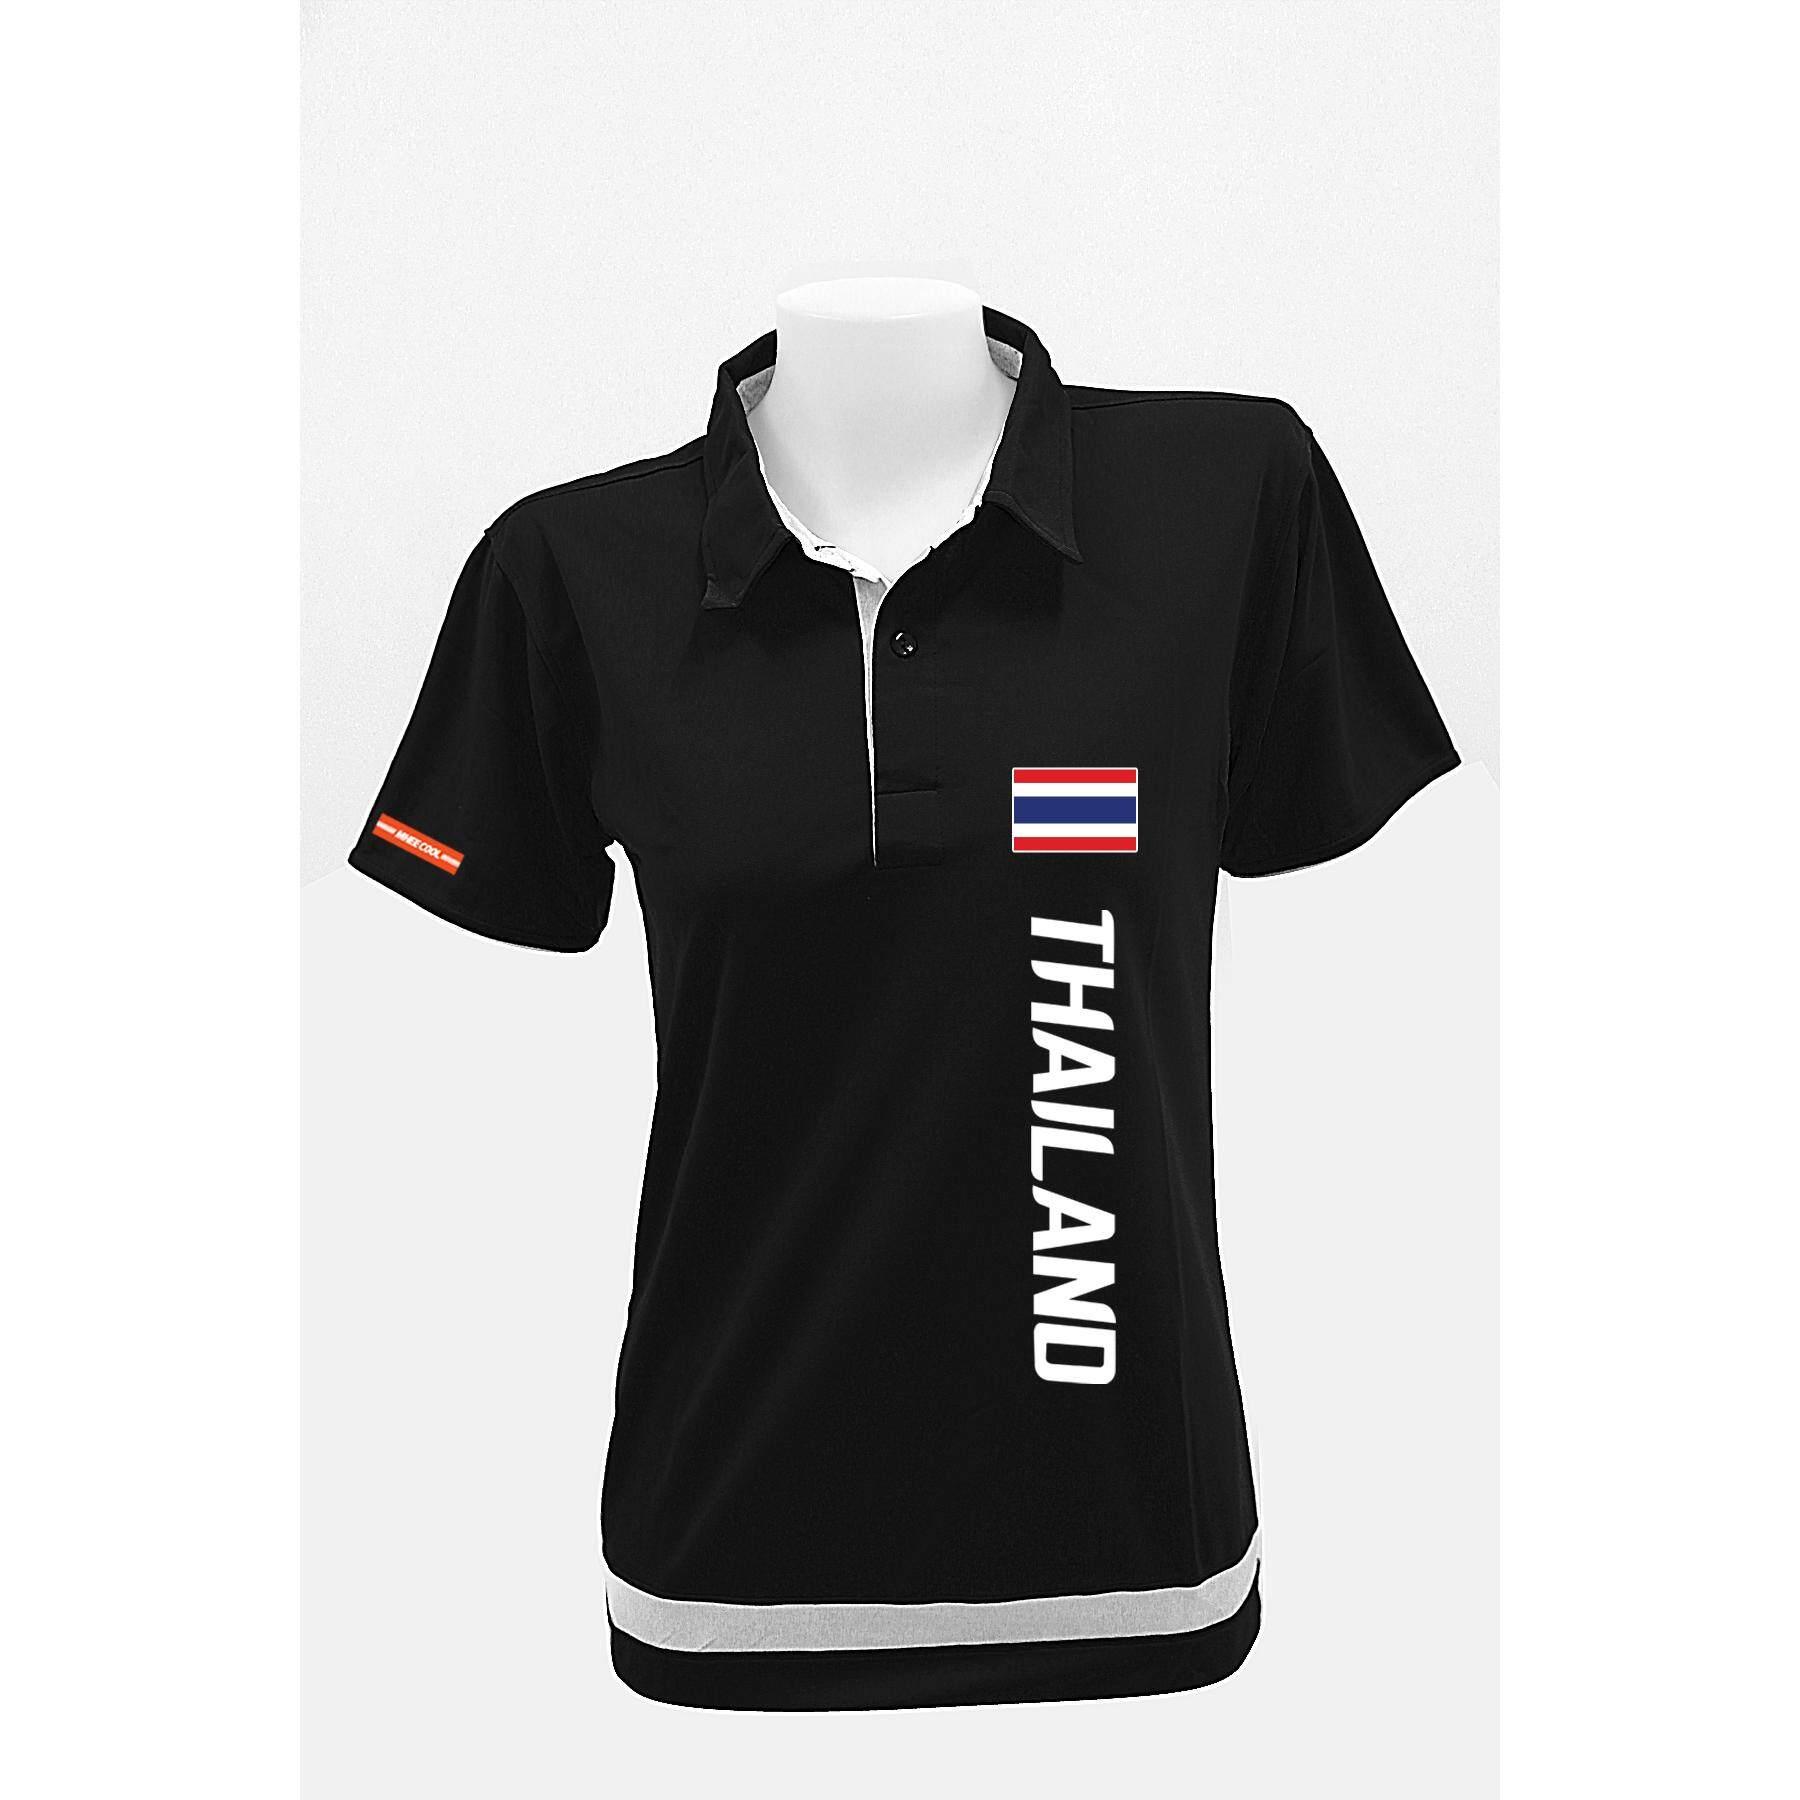 Mheecool เสื้อโปโล Pro1 สีดำ ใหม่ล่าสุด